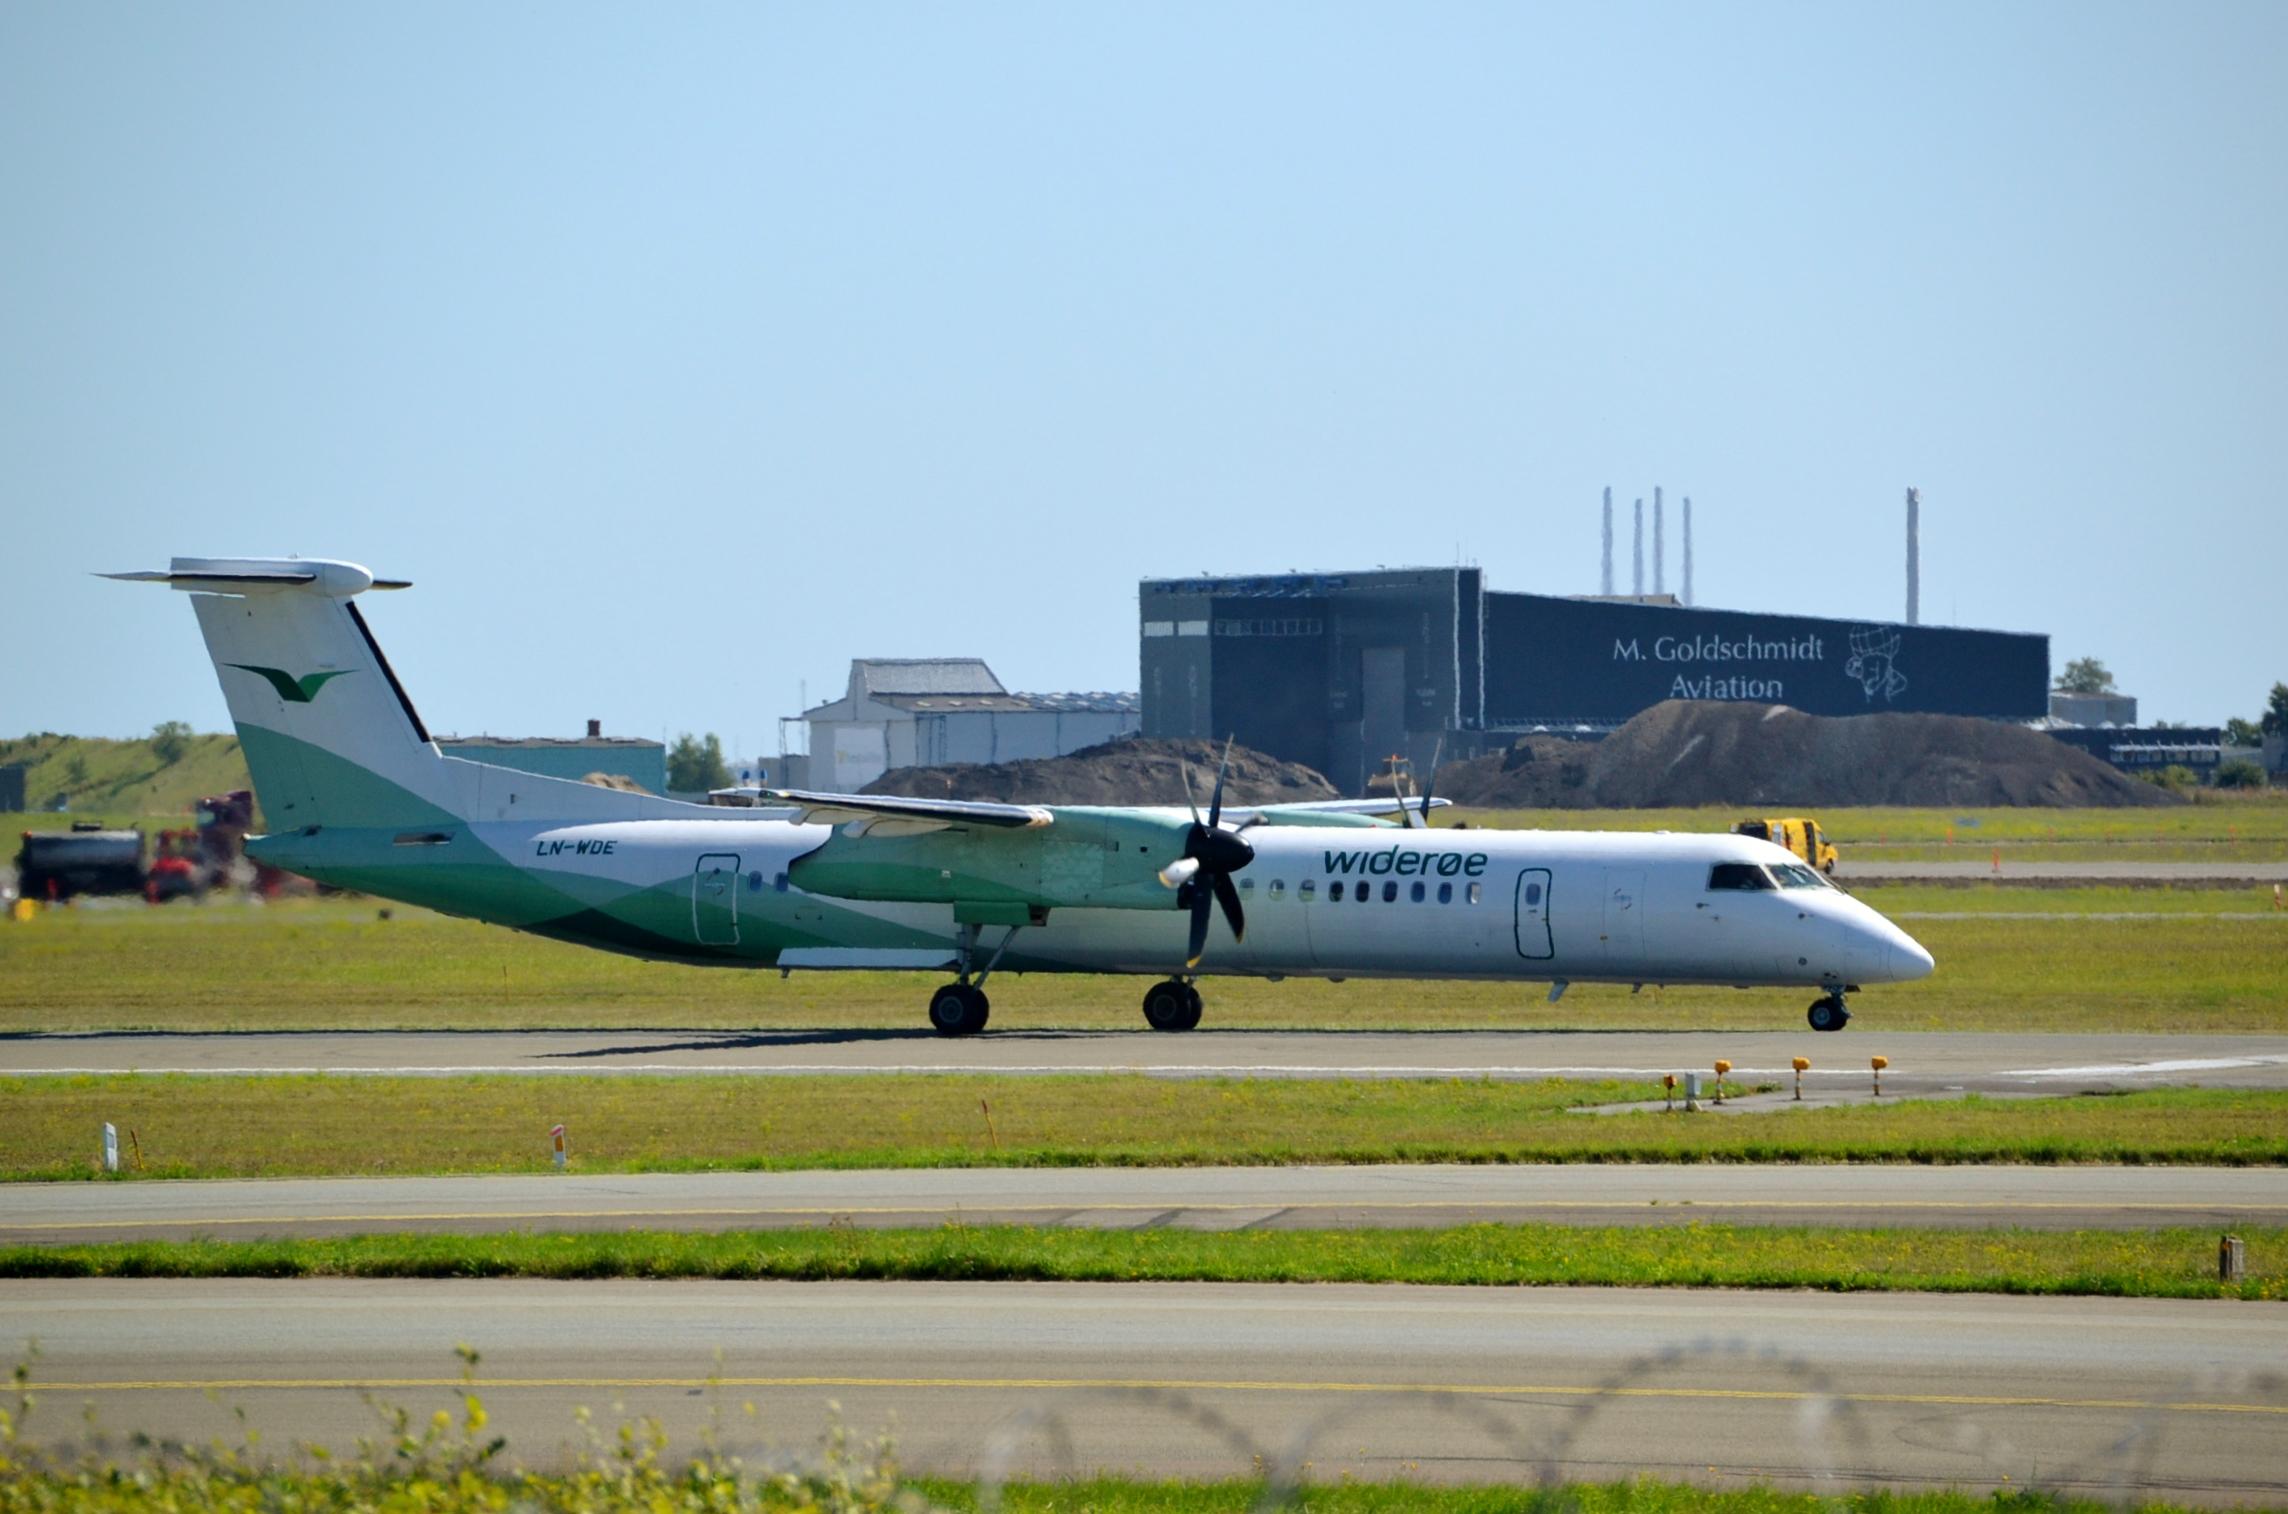 Bombardier Dash 8-Q400 (LN-WDE) i Widerøe-bemaling. (Fofo: Alec Wilson | CC 2.0)